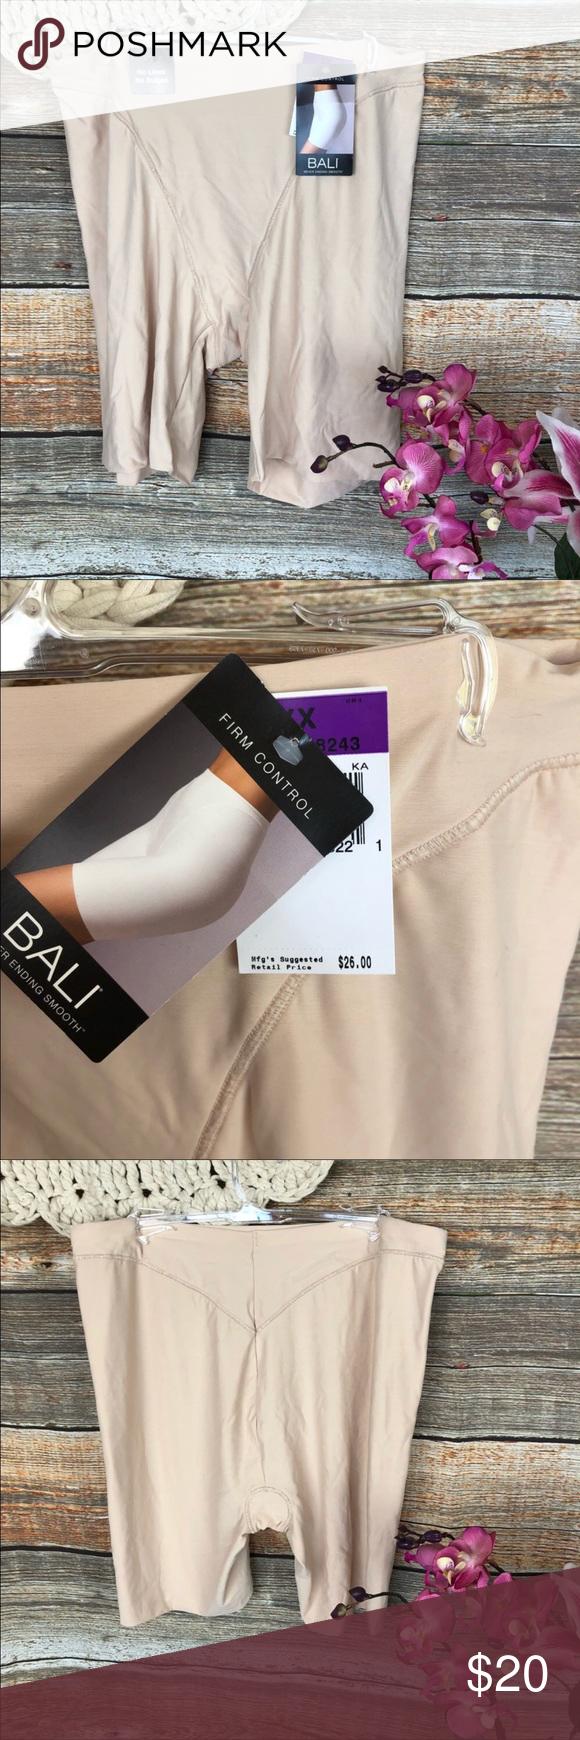 Bali XL XXL BODY SLIMMING Shorts NWT in My Posh Closet